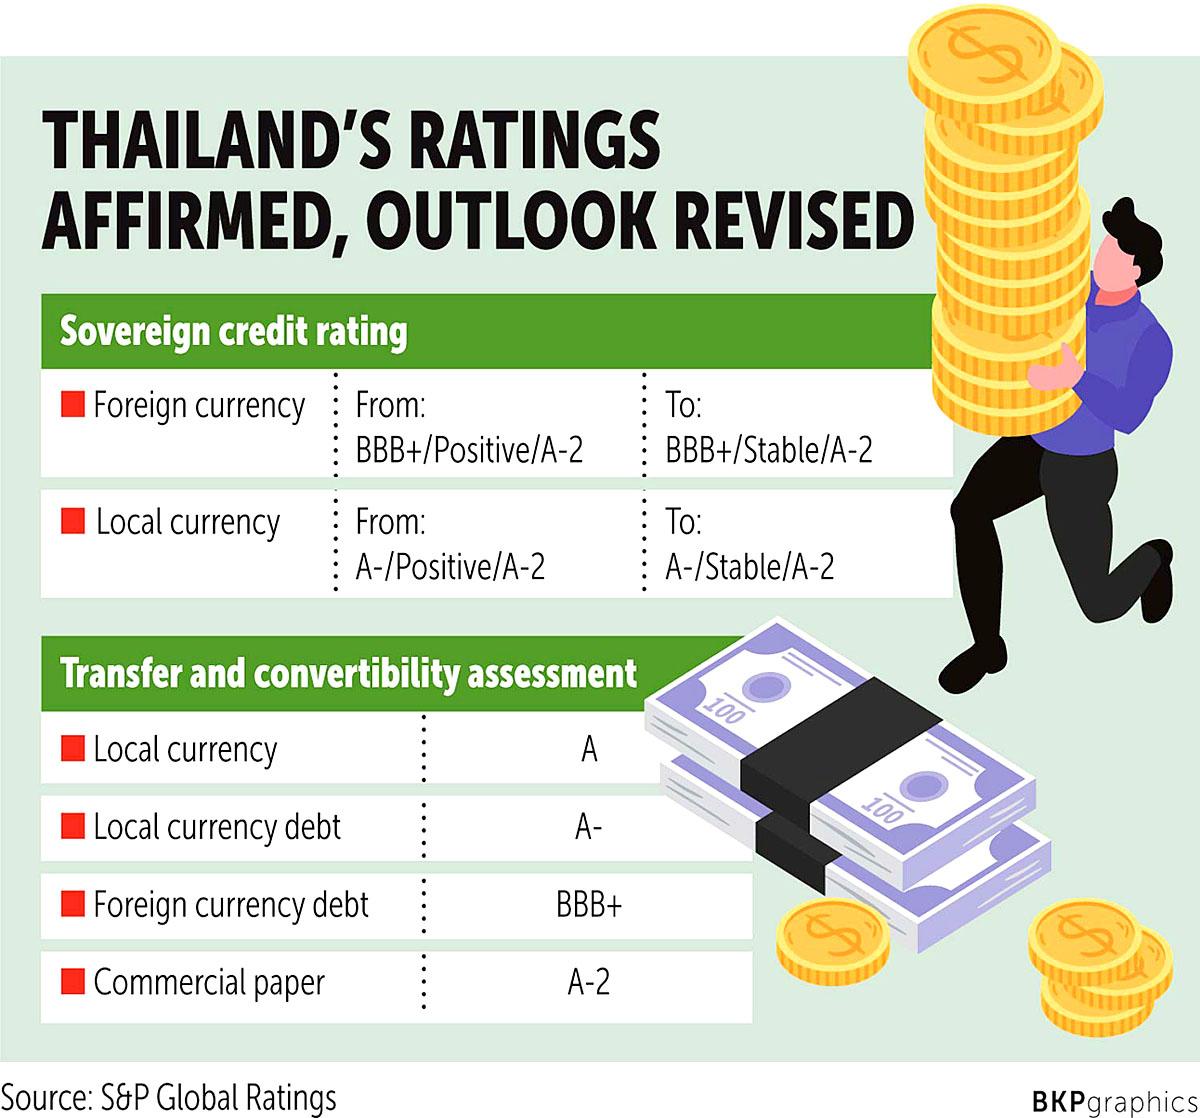 Bangkok Post 200415 Rating.jpg